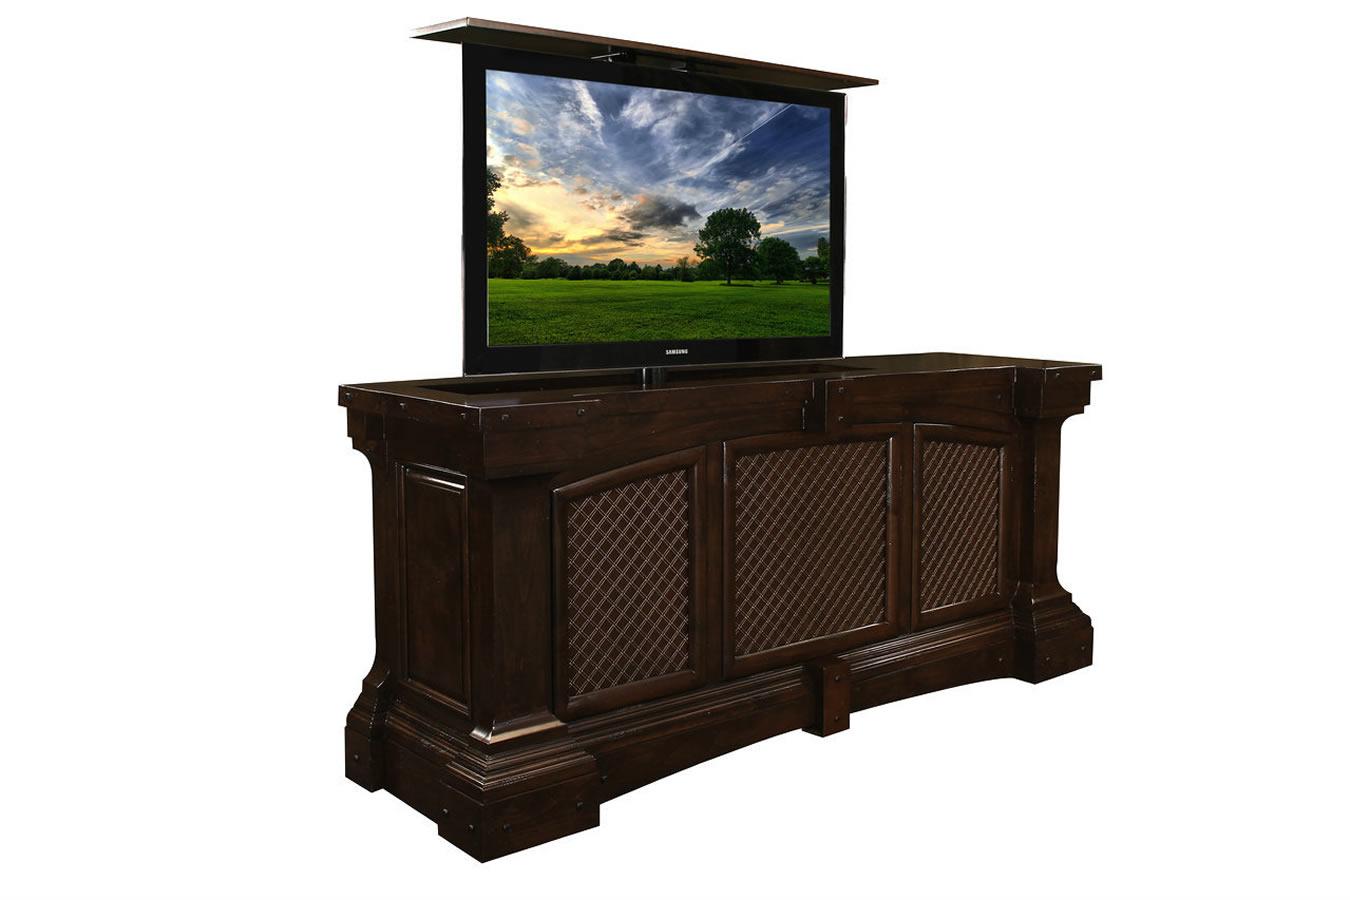 tv lifts archive cabinet tronix. Black Bedroom Furniture Sets. Home Design Ideas